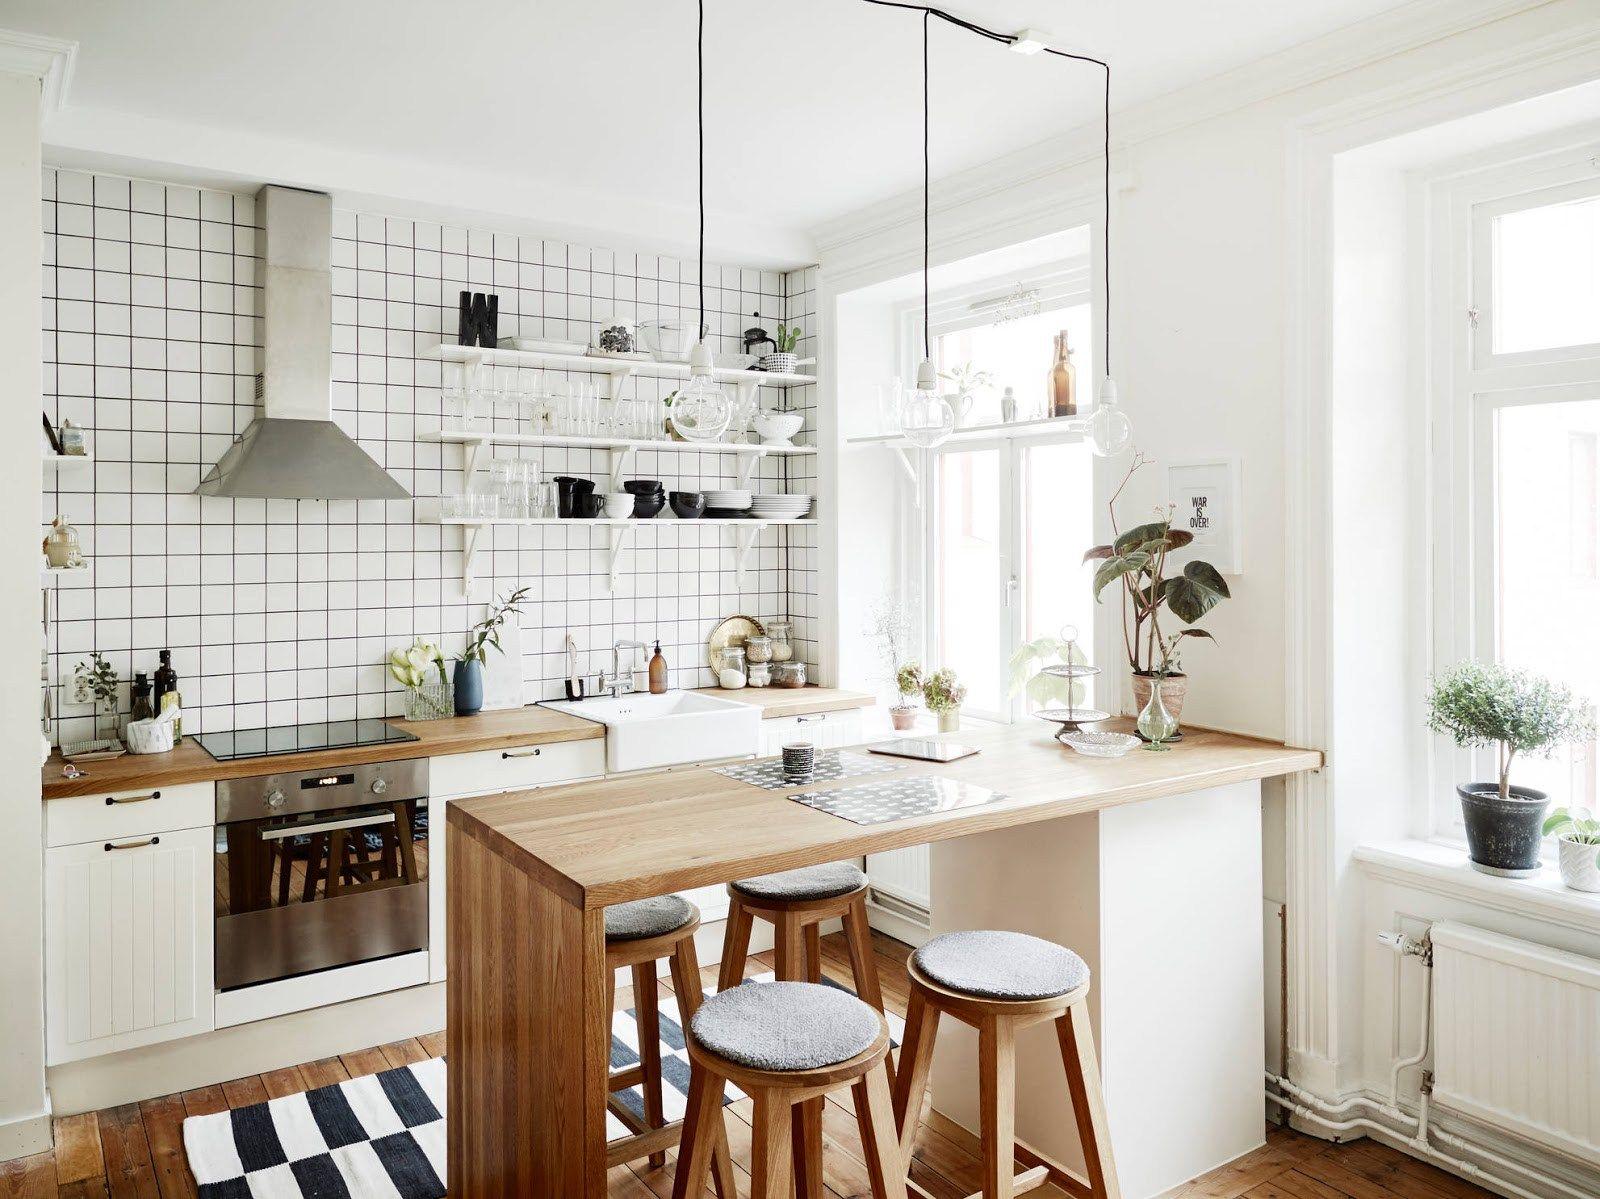 Nordhemsgatan-67-living-room-kitchen-cococozy-4.jpg (1600×1199)